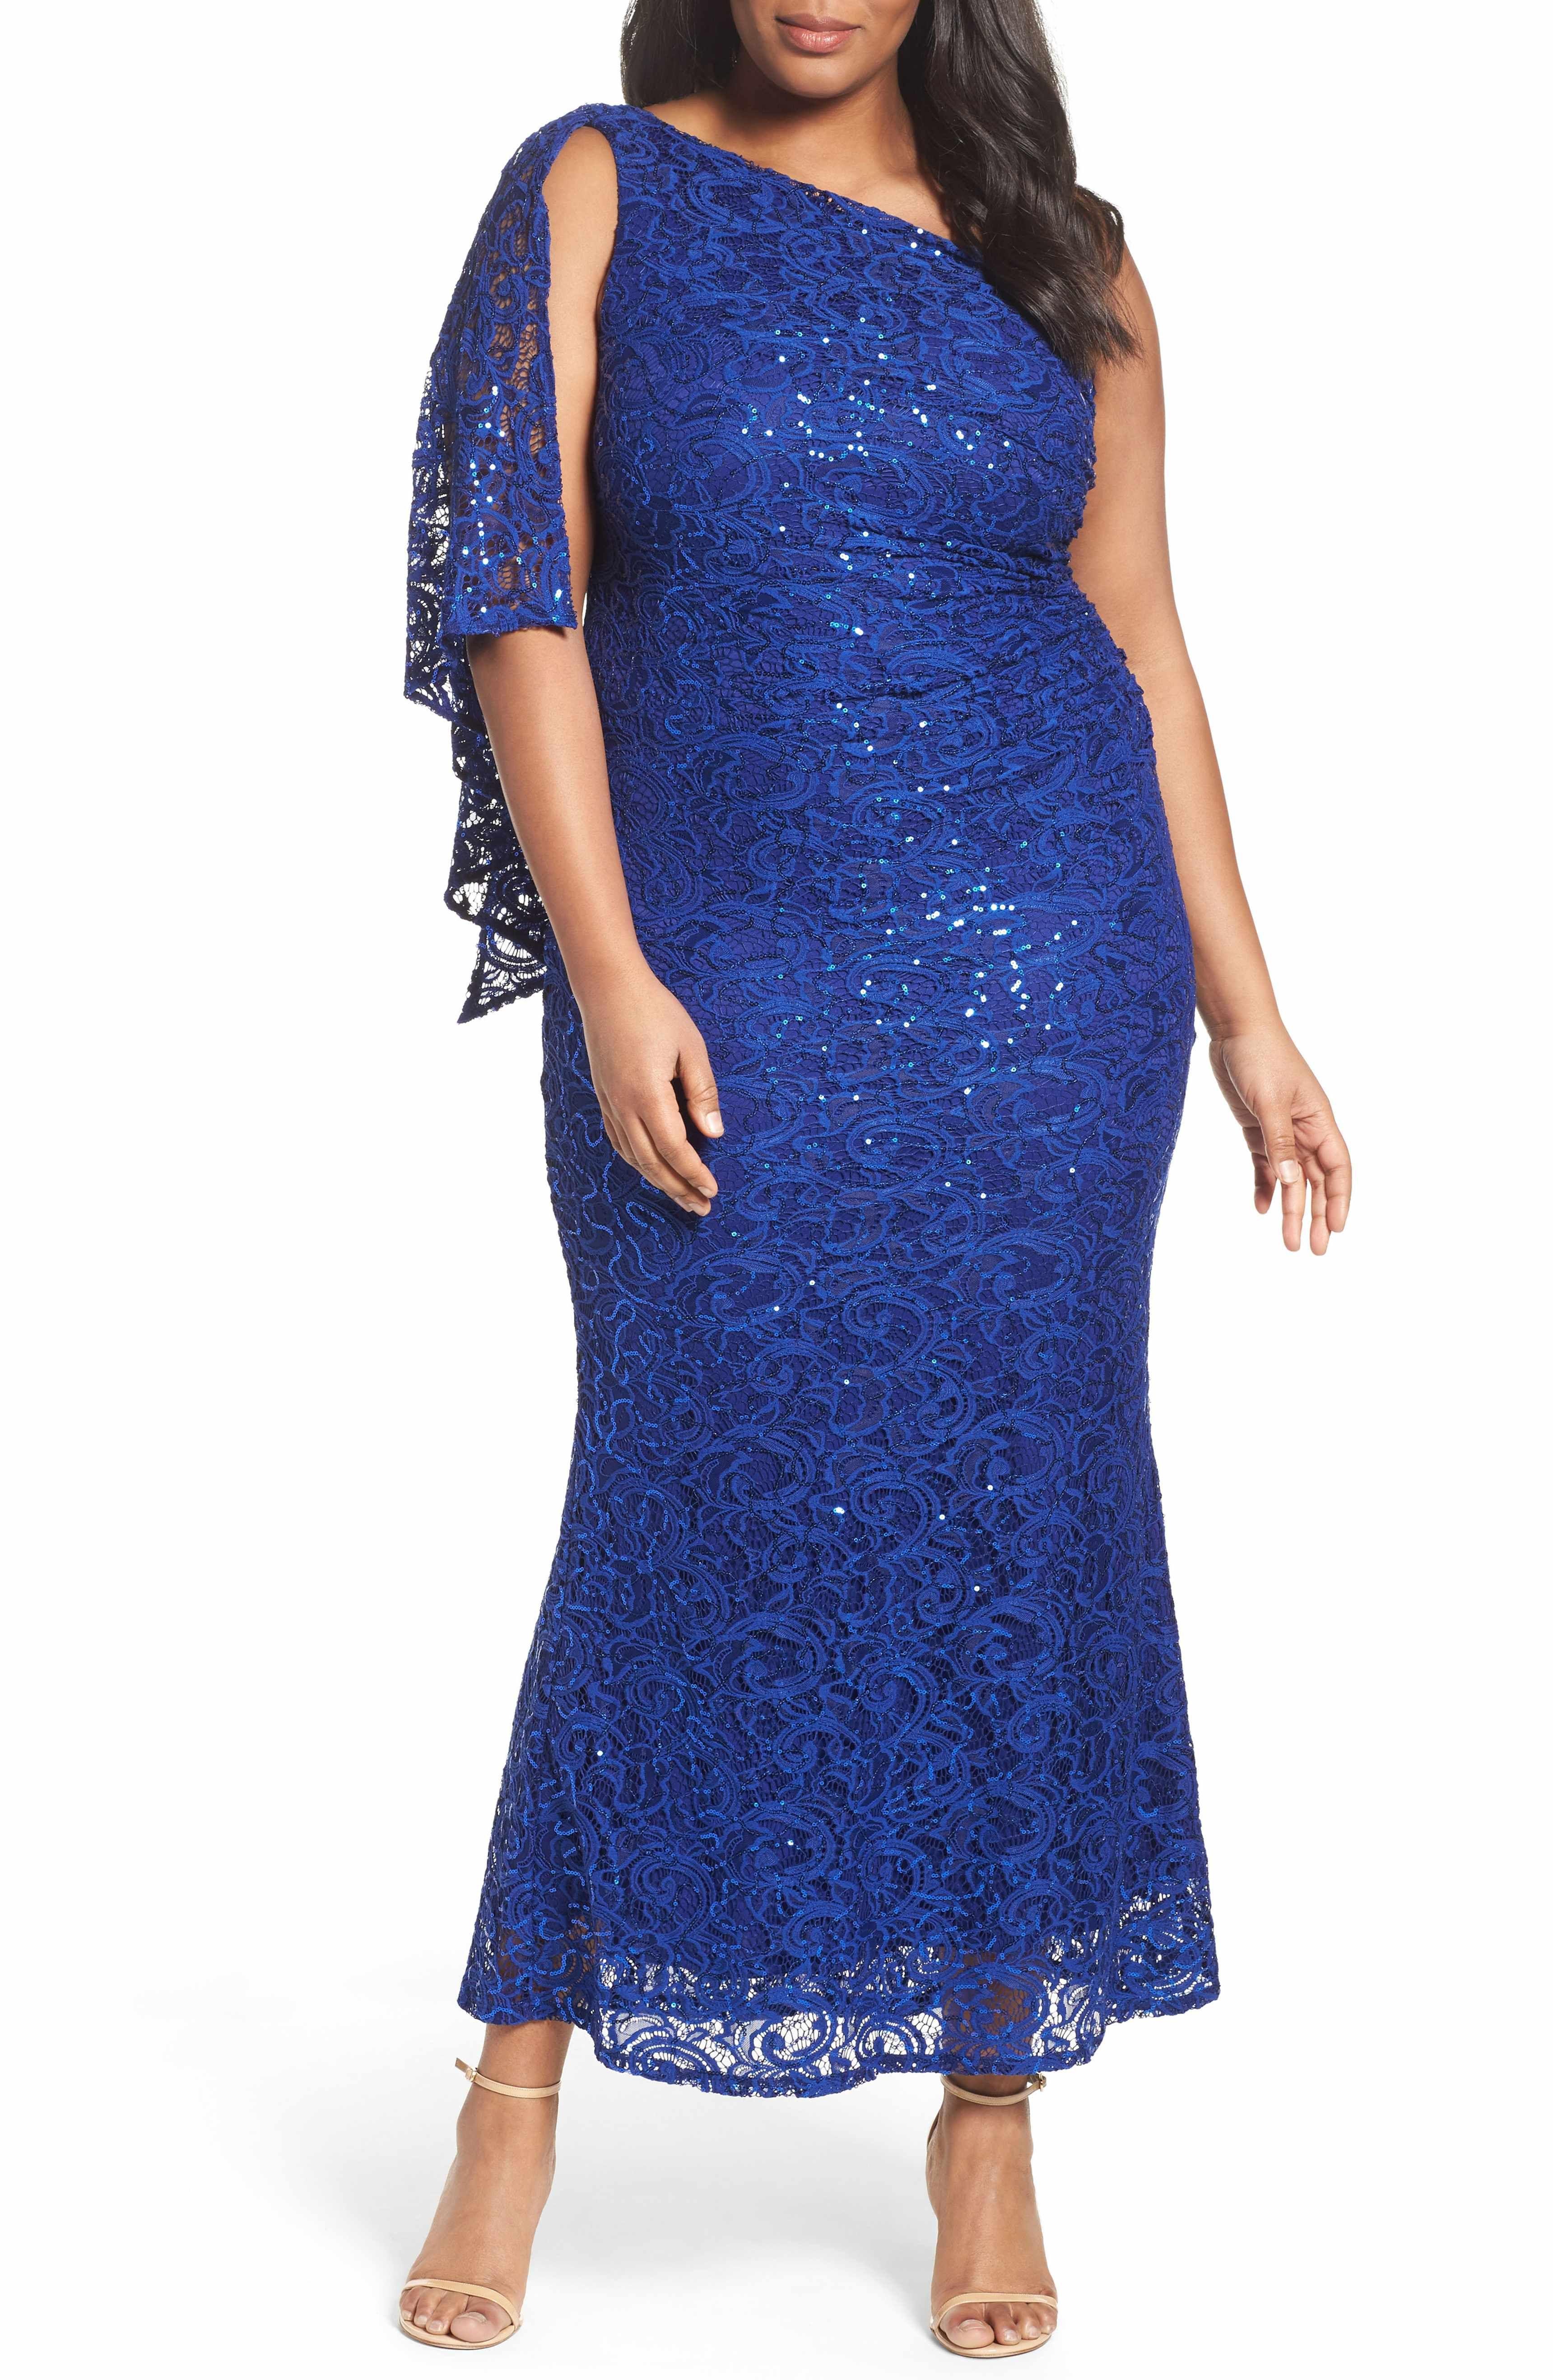 Main Image Marina Sequin Lace One Shoulder Gown Plus Size One Shoulder Gown Women Lace Dress Plus Size Dresses [ 5272 x 3440 Pixel ]